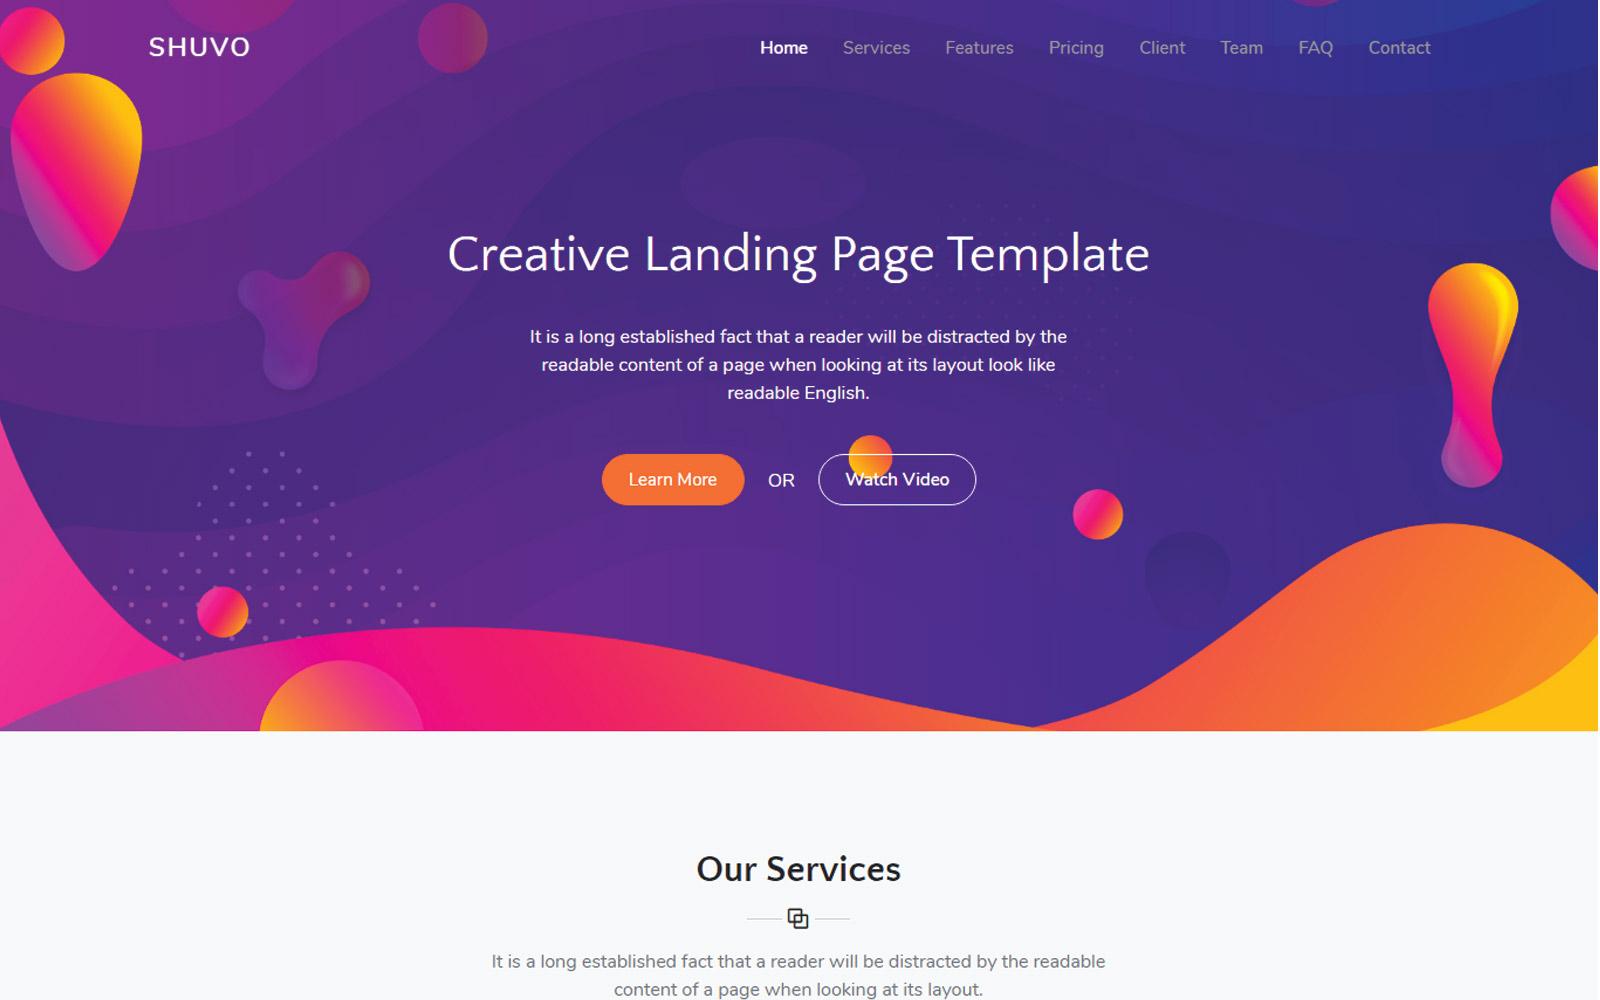 Shuvo Creative Landing Page Template